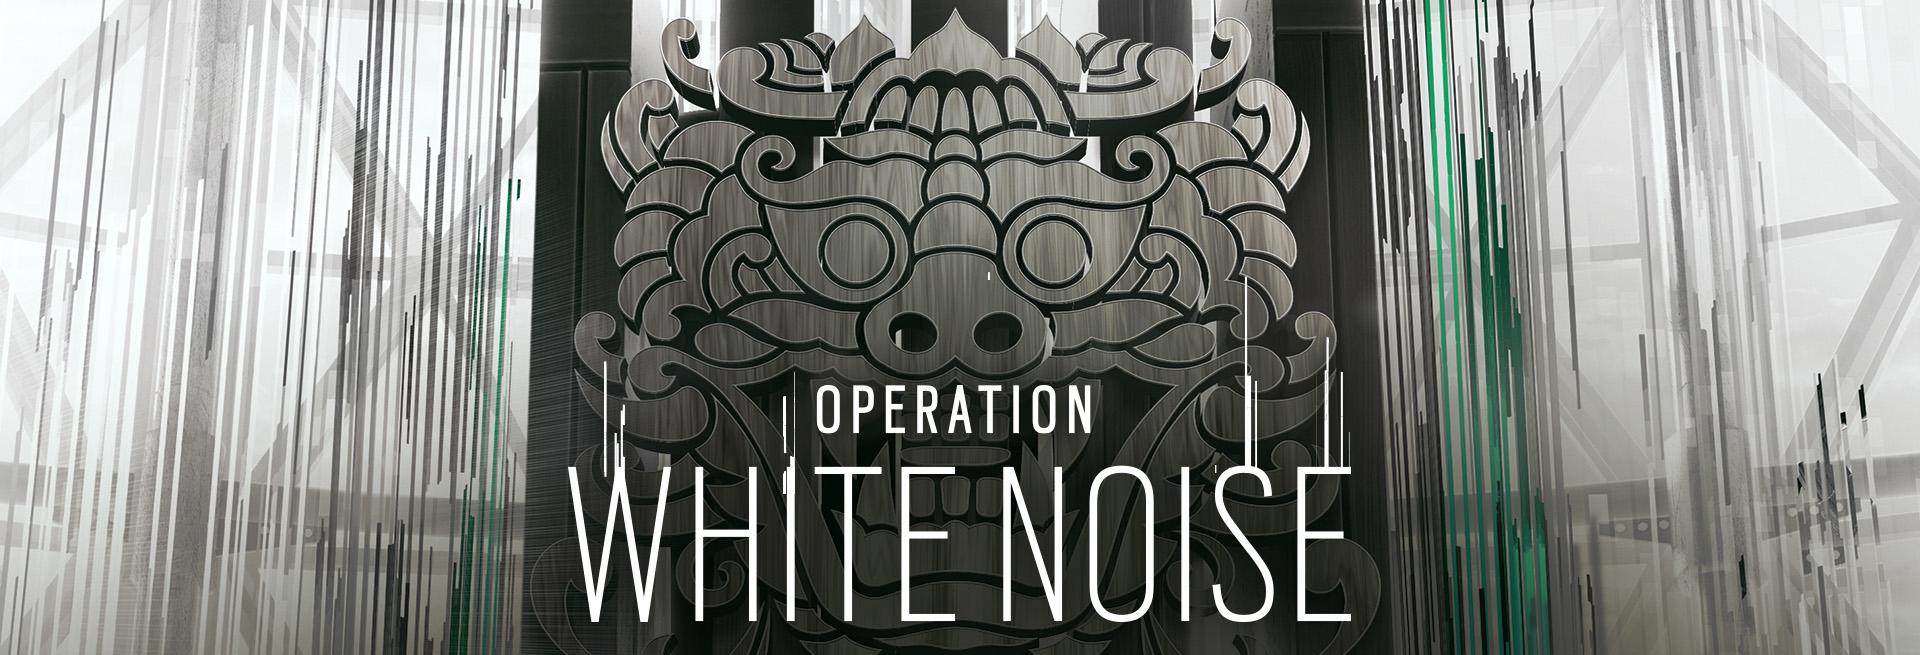 Rainbow Six Siege Operation White Noise Announced, Set in South Korea | DeviceDaily.com